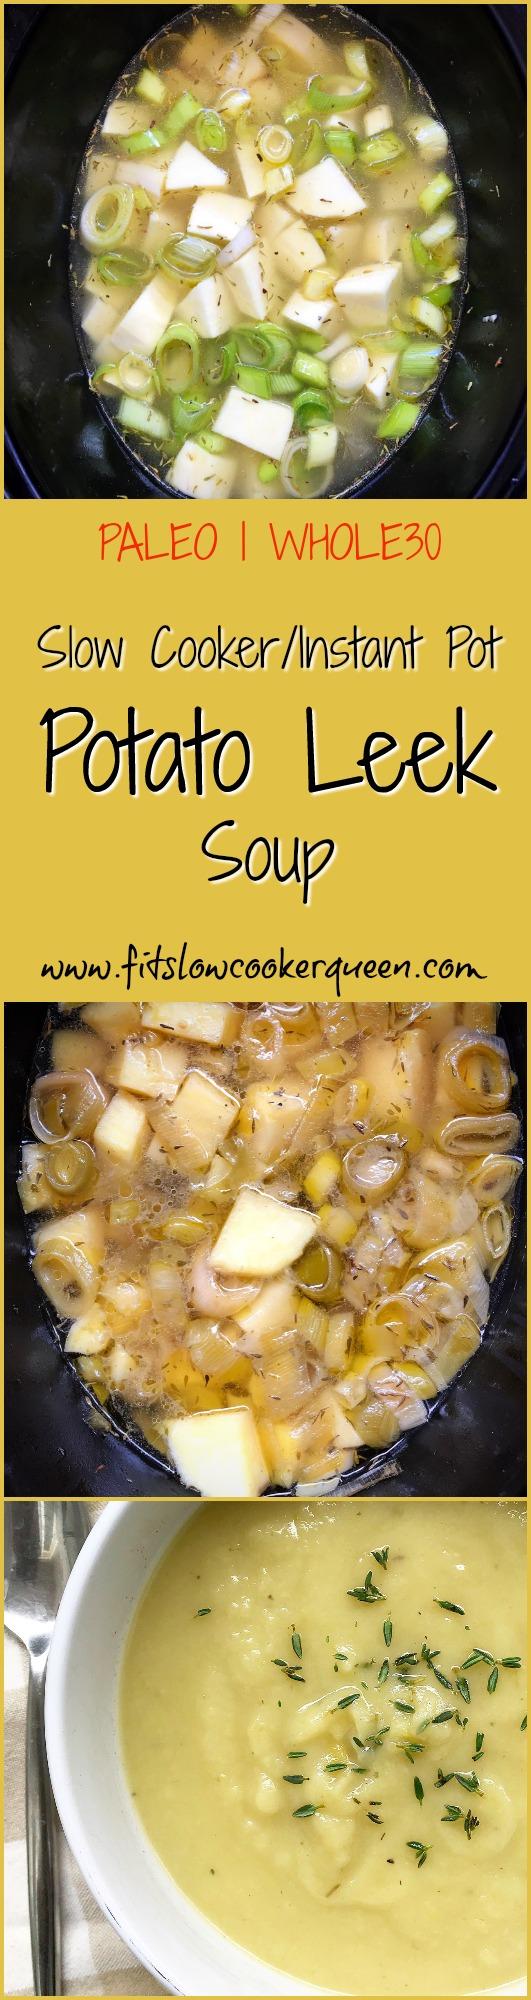 another pinterest pin for Slow Cooker_Instant Pot Potato & Leek Soup (Paleo,Whole30)